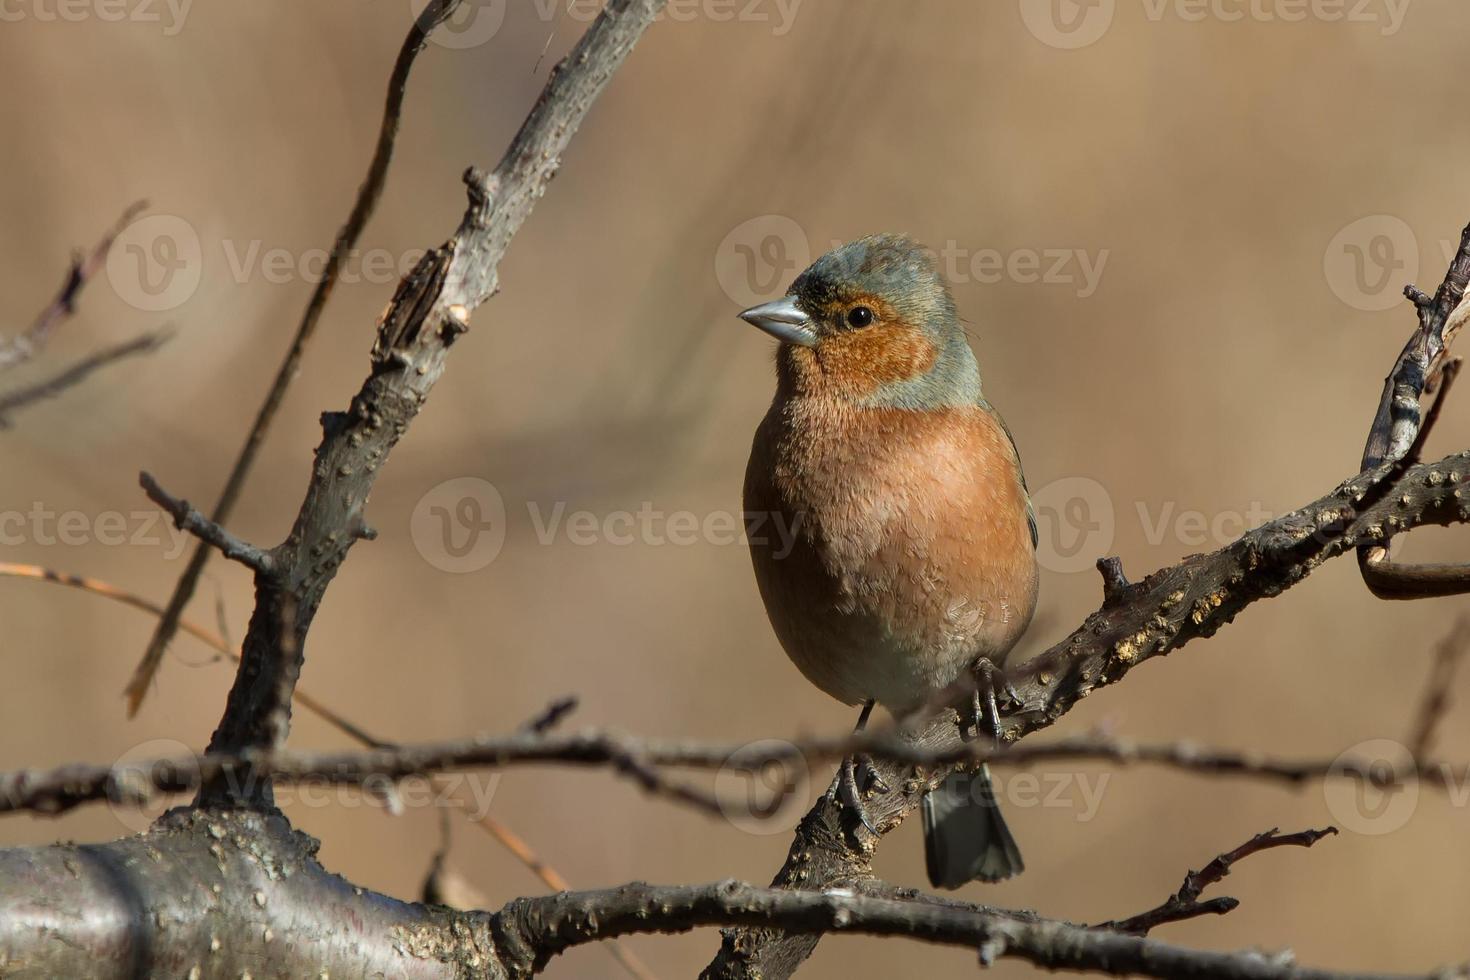 Chaffinch sitting on branch photo